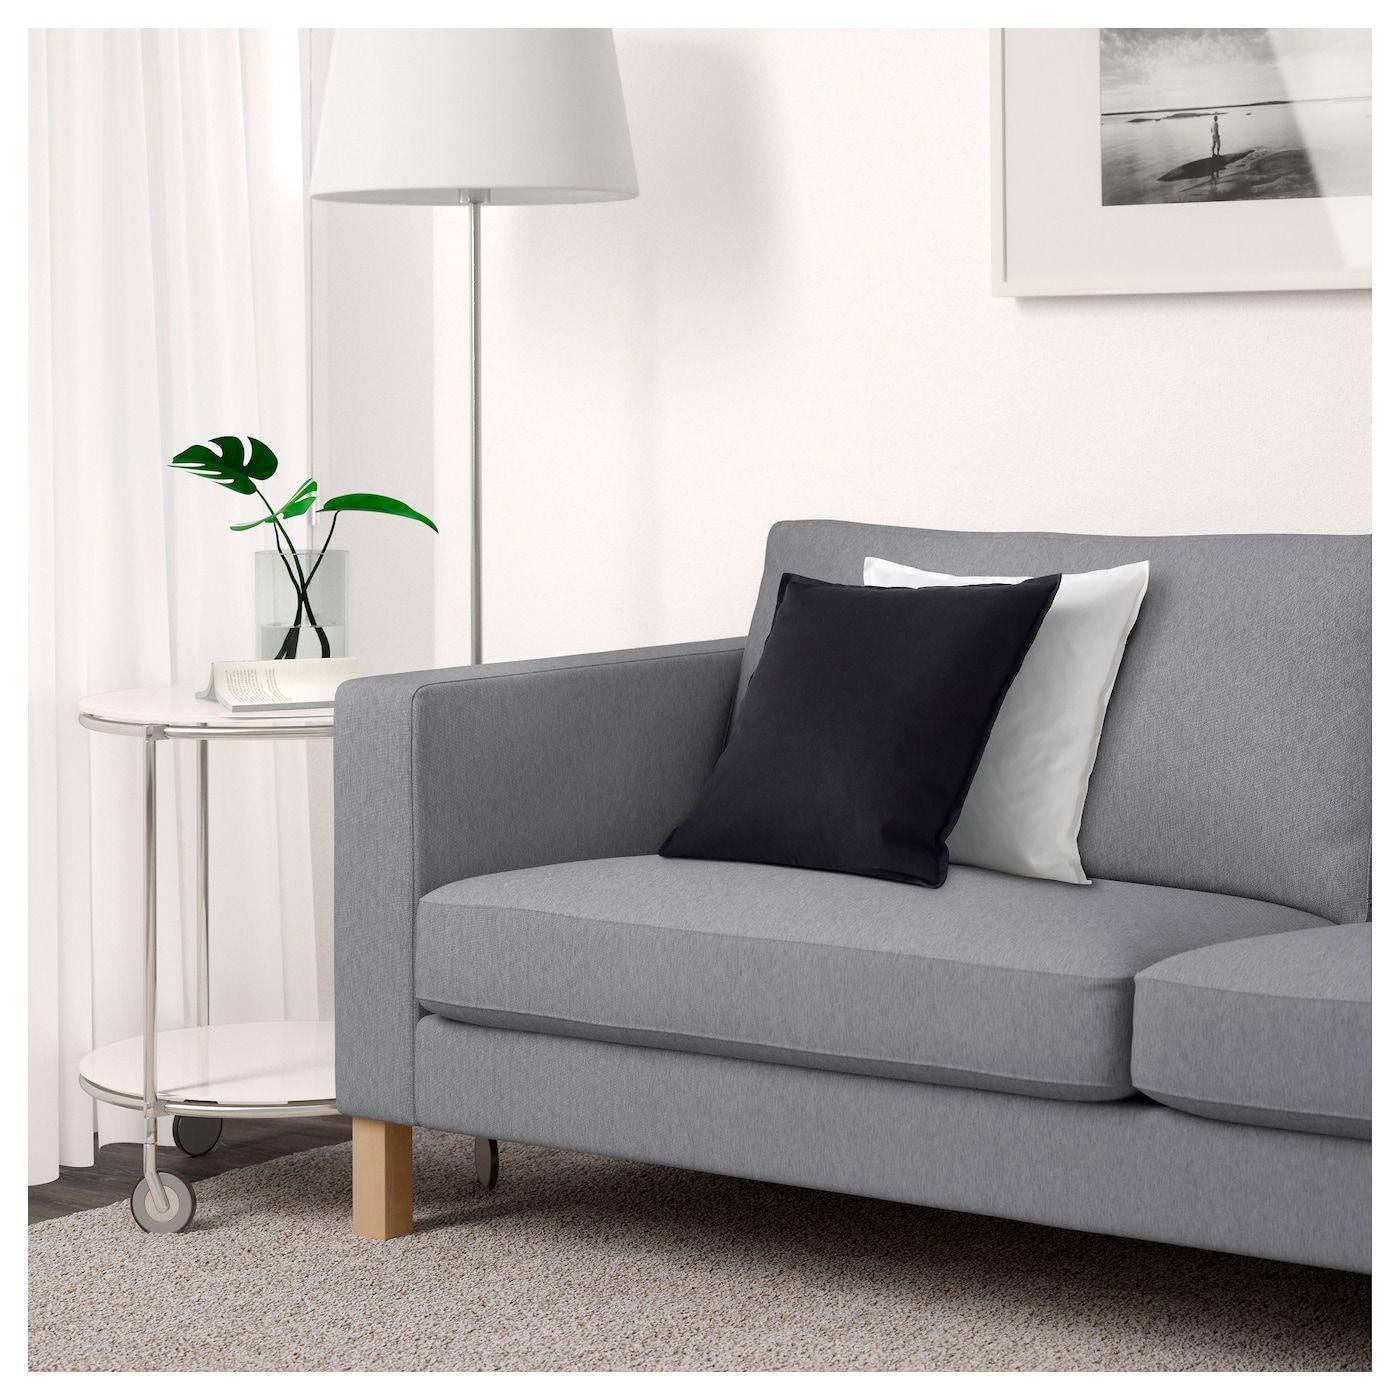 sofa karlstad knisa light gray in 2019 my home ikea sofa ikea rh pinterest com